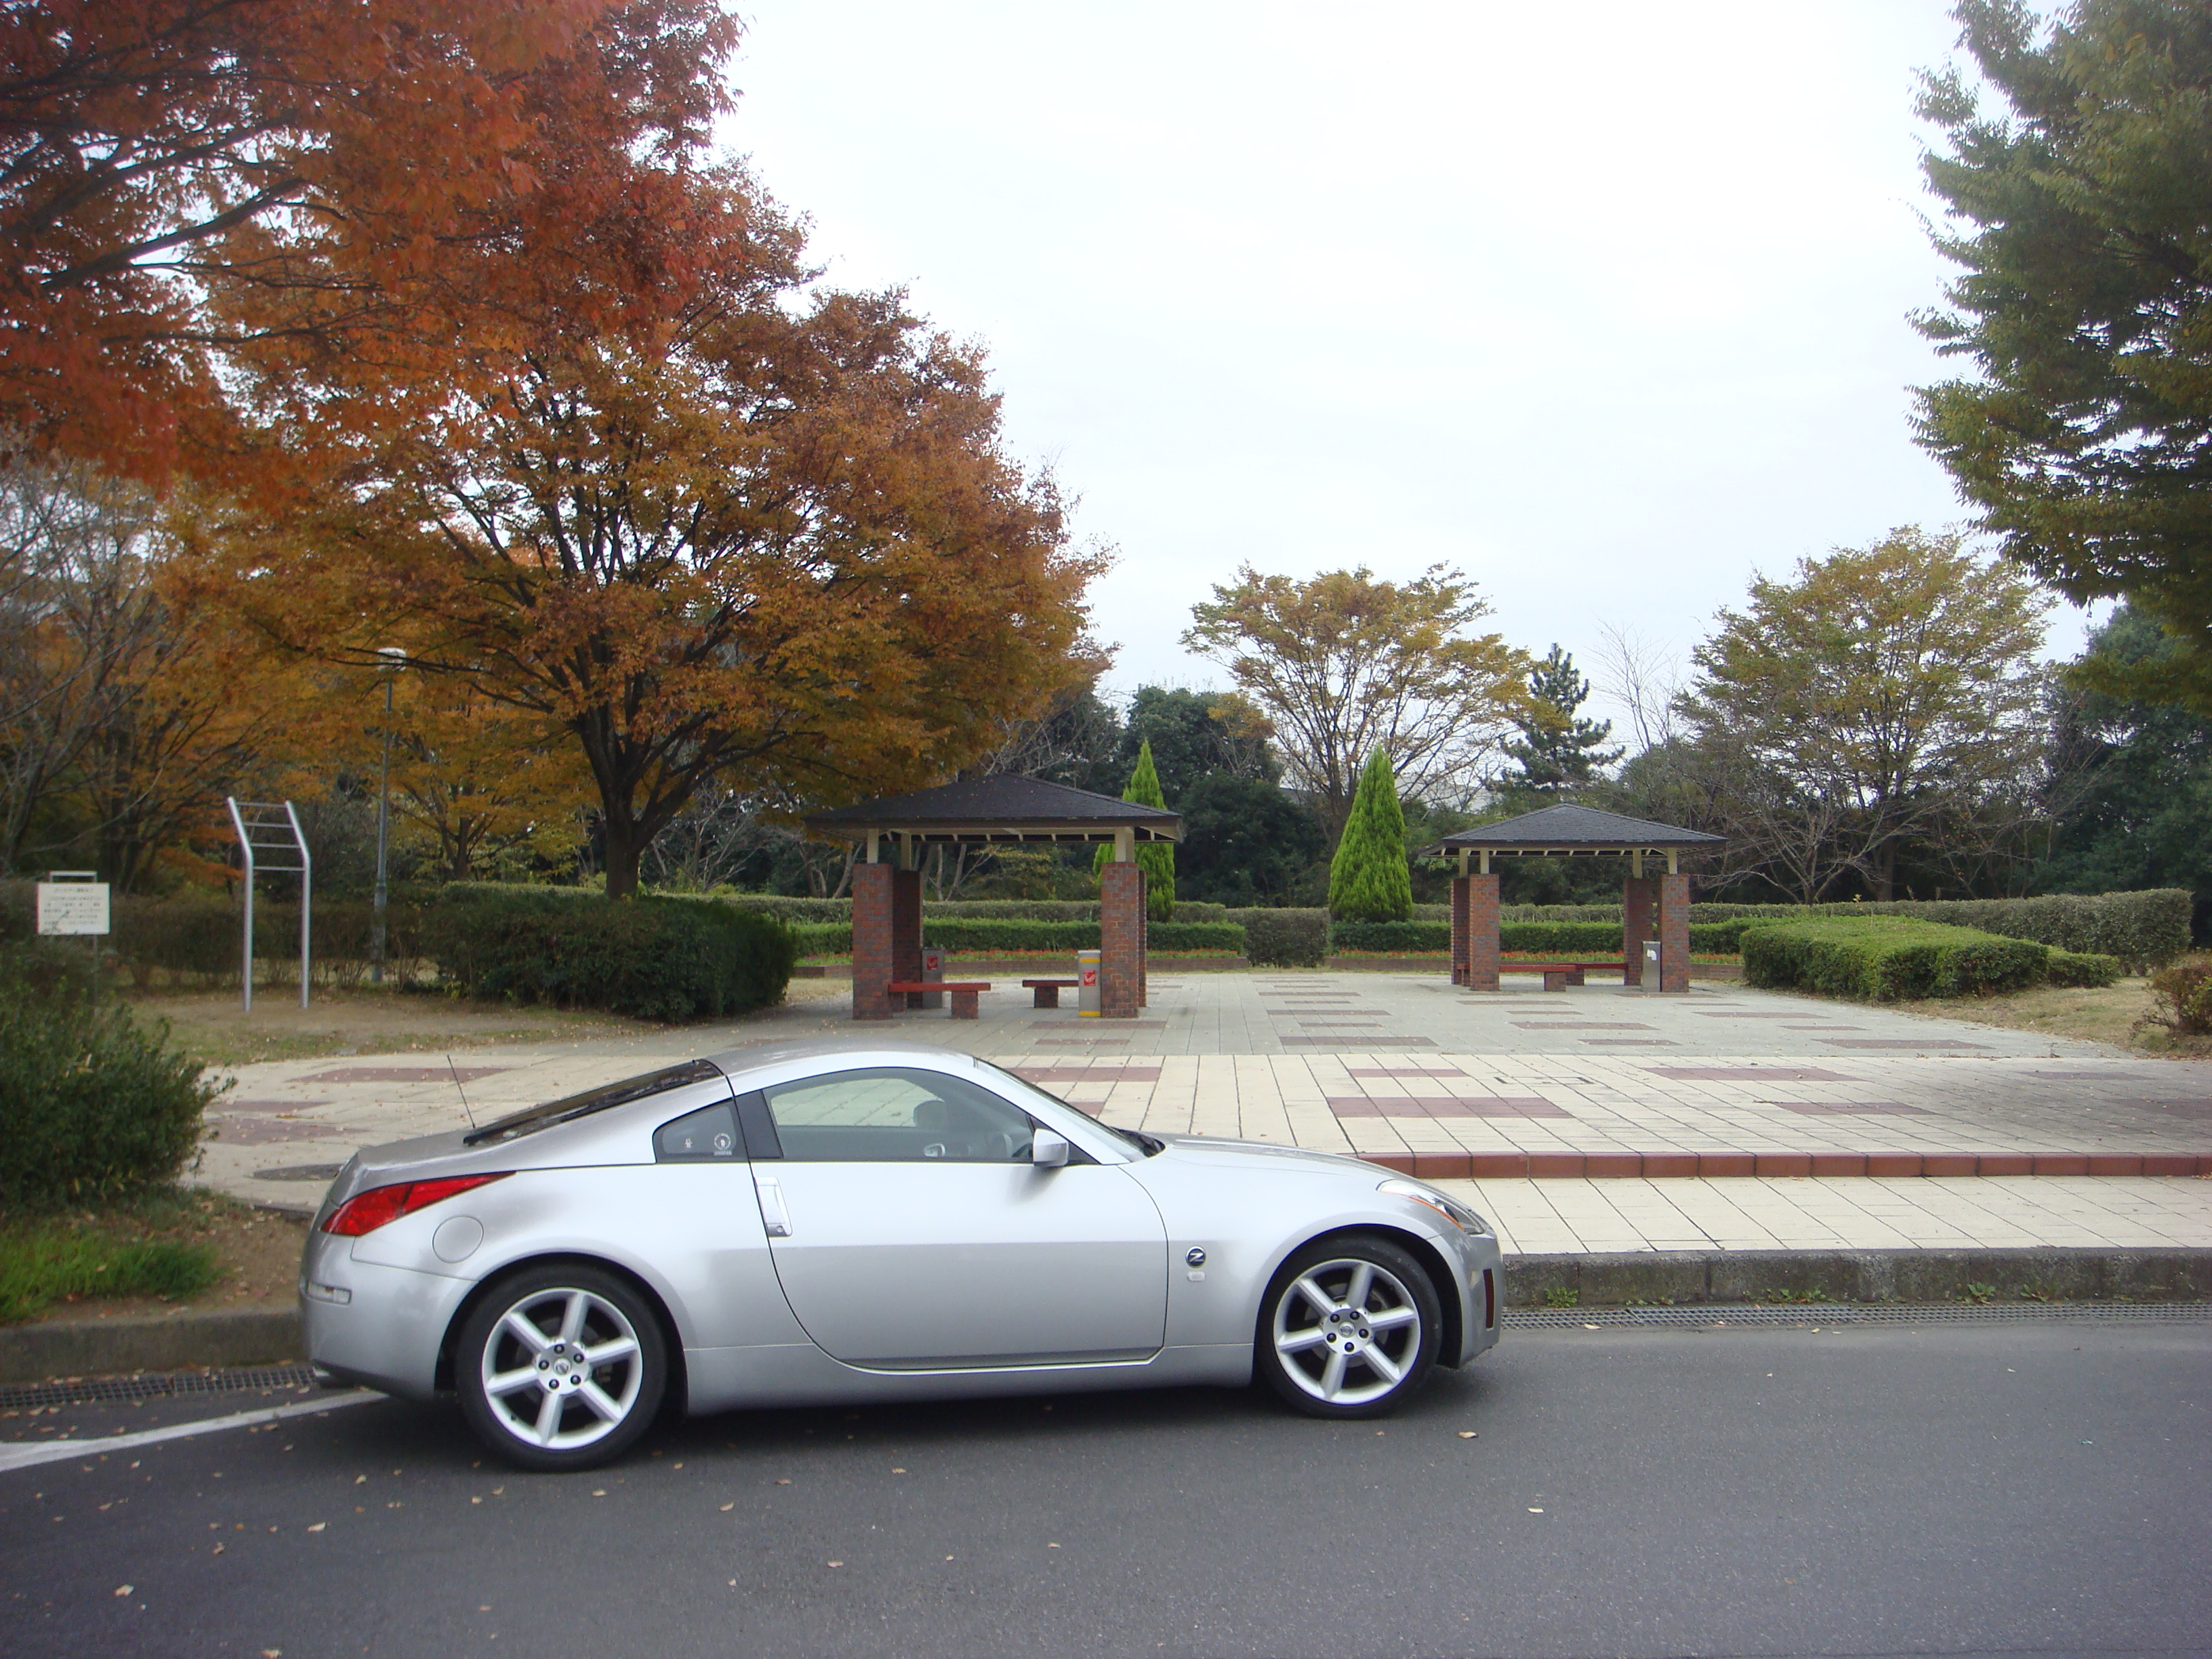 pin nissan 350z japan brand luxury roadster white wheels hd on pinterest. Black Bedroom Furniture Sets. Home Design Ideas